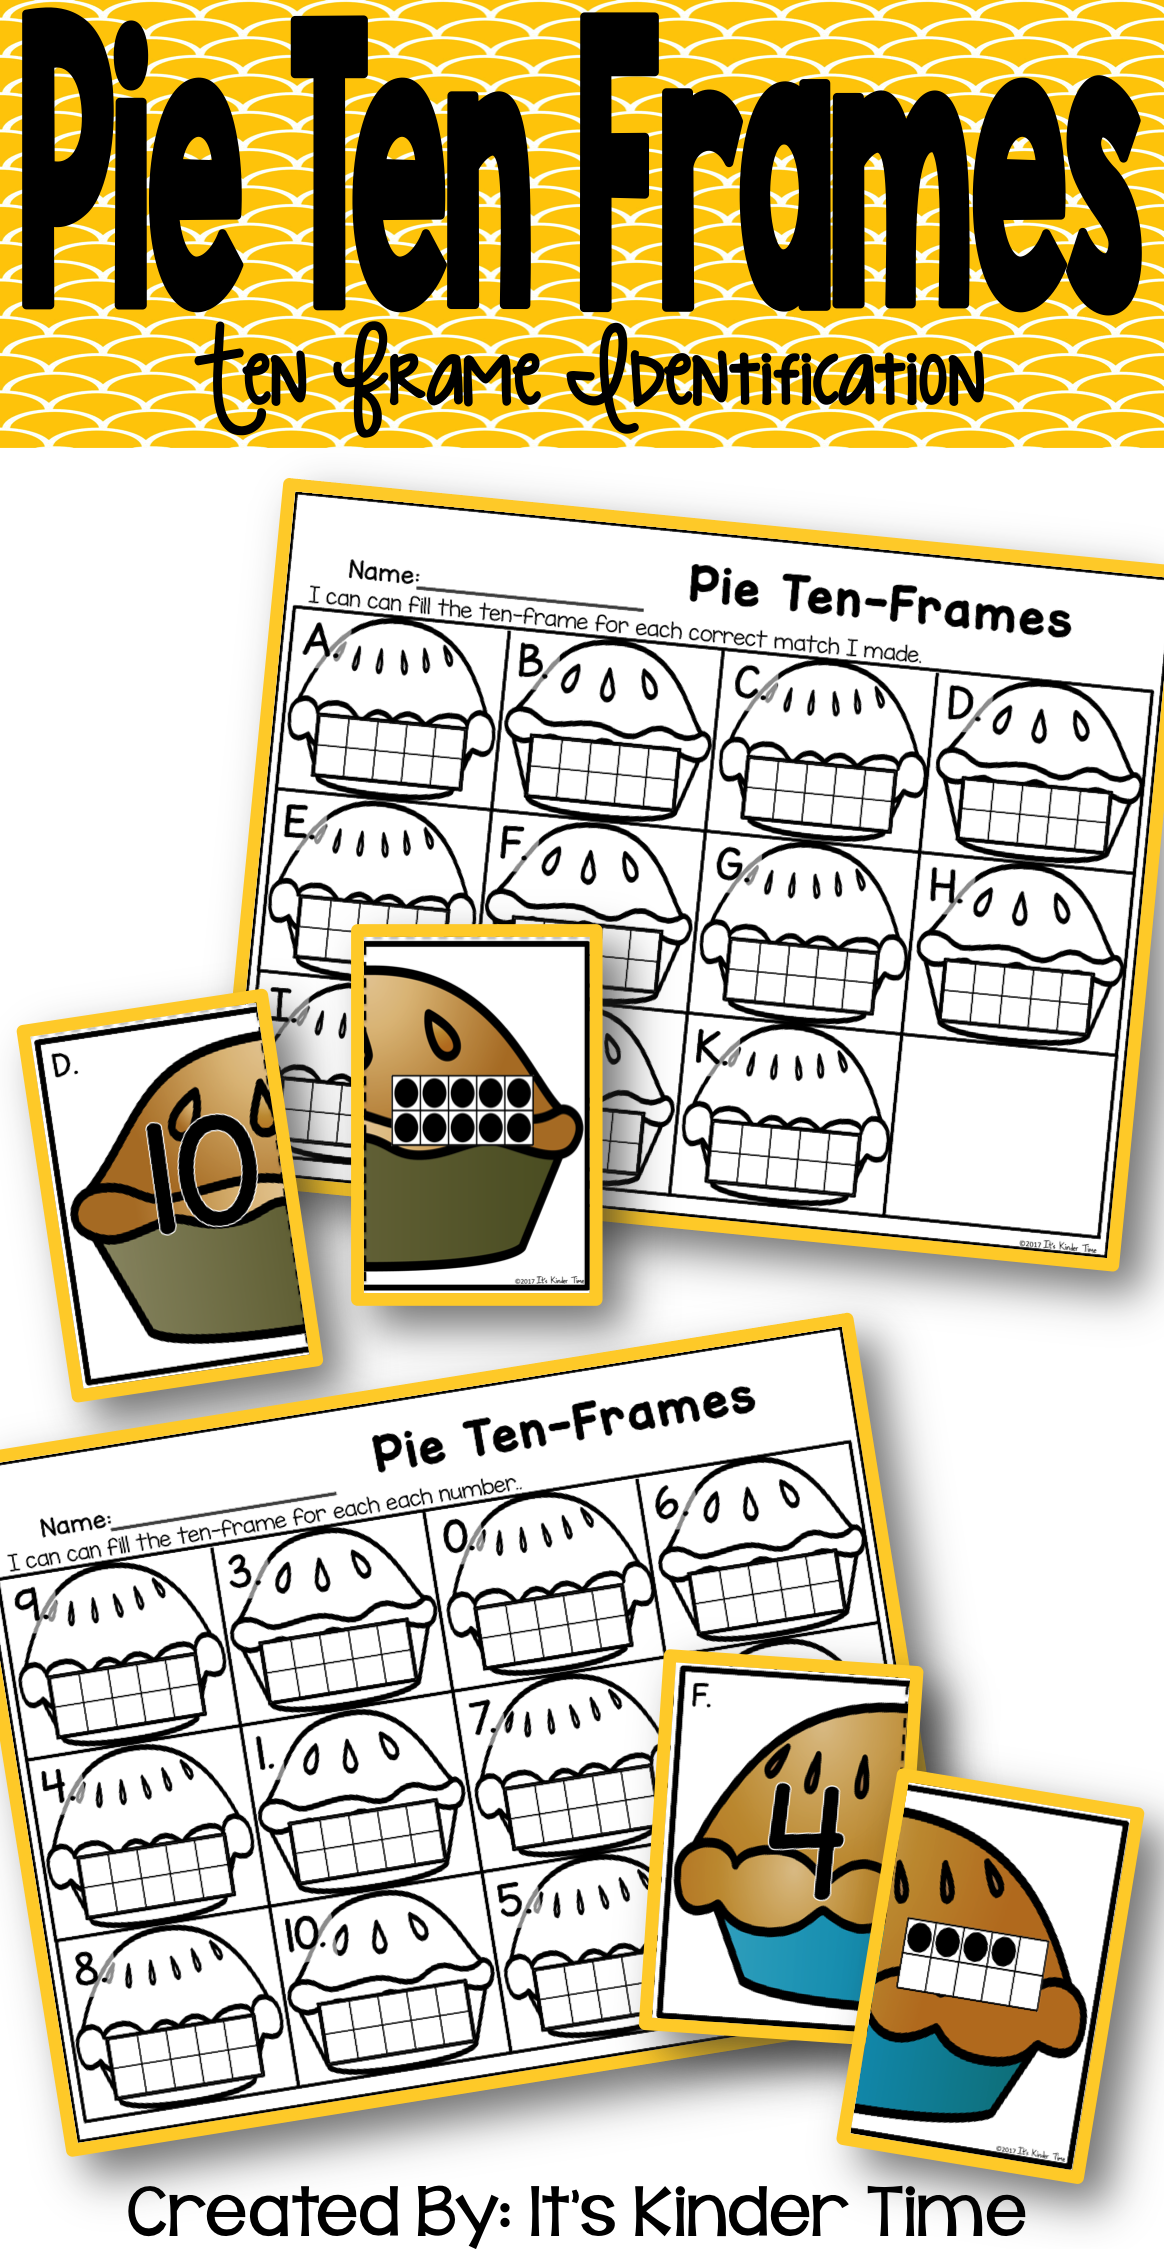 Pie Ten Frames